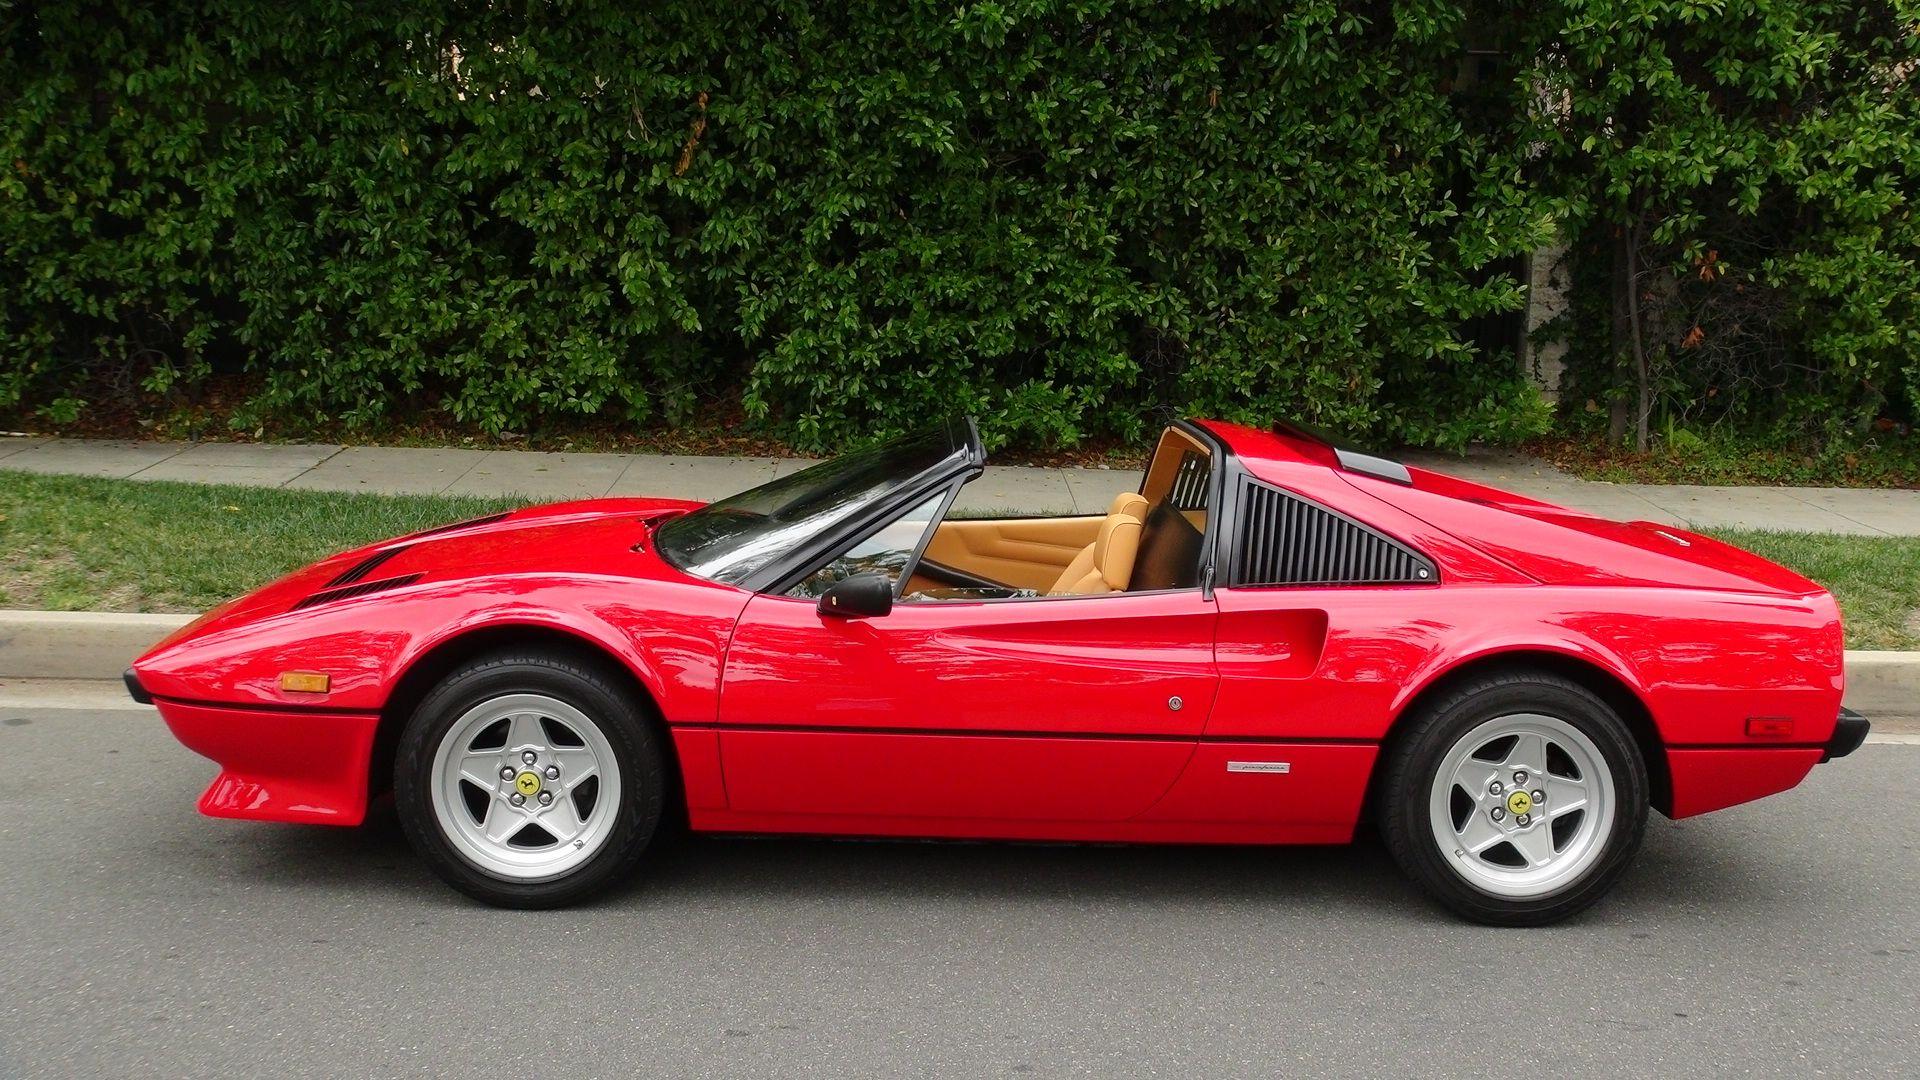 1983 Ferrari 308 Gts Quattrovalvole Sports Cars Ferrari Magnum Pi Ferrari Ferrari